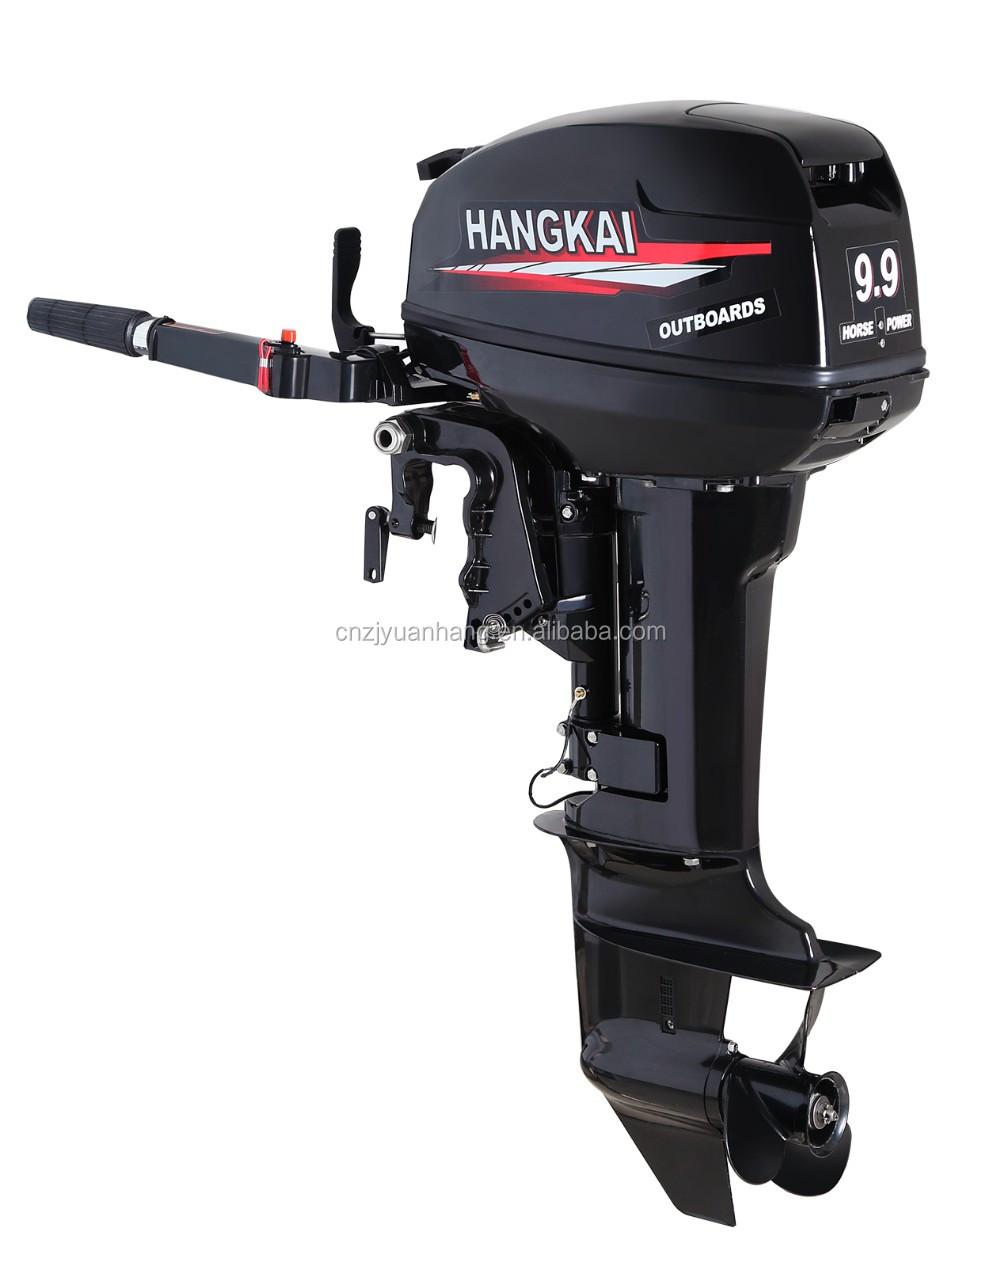 Hangkai 2 stroke boat engine outboard motor for sale for Buy boat motors online